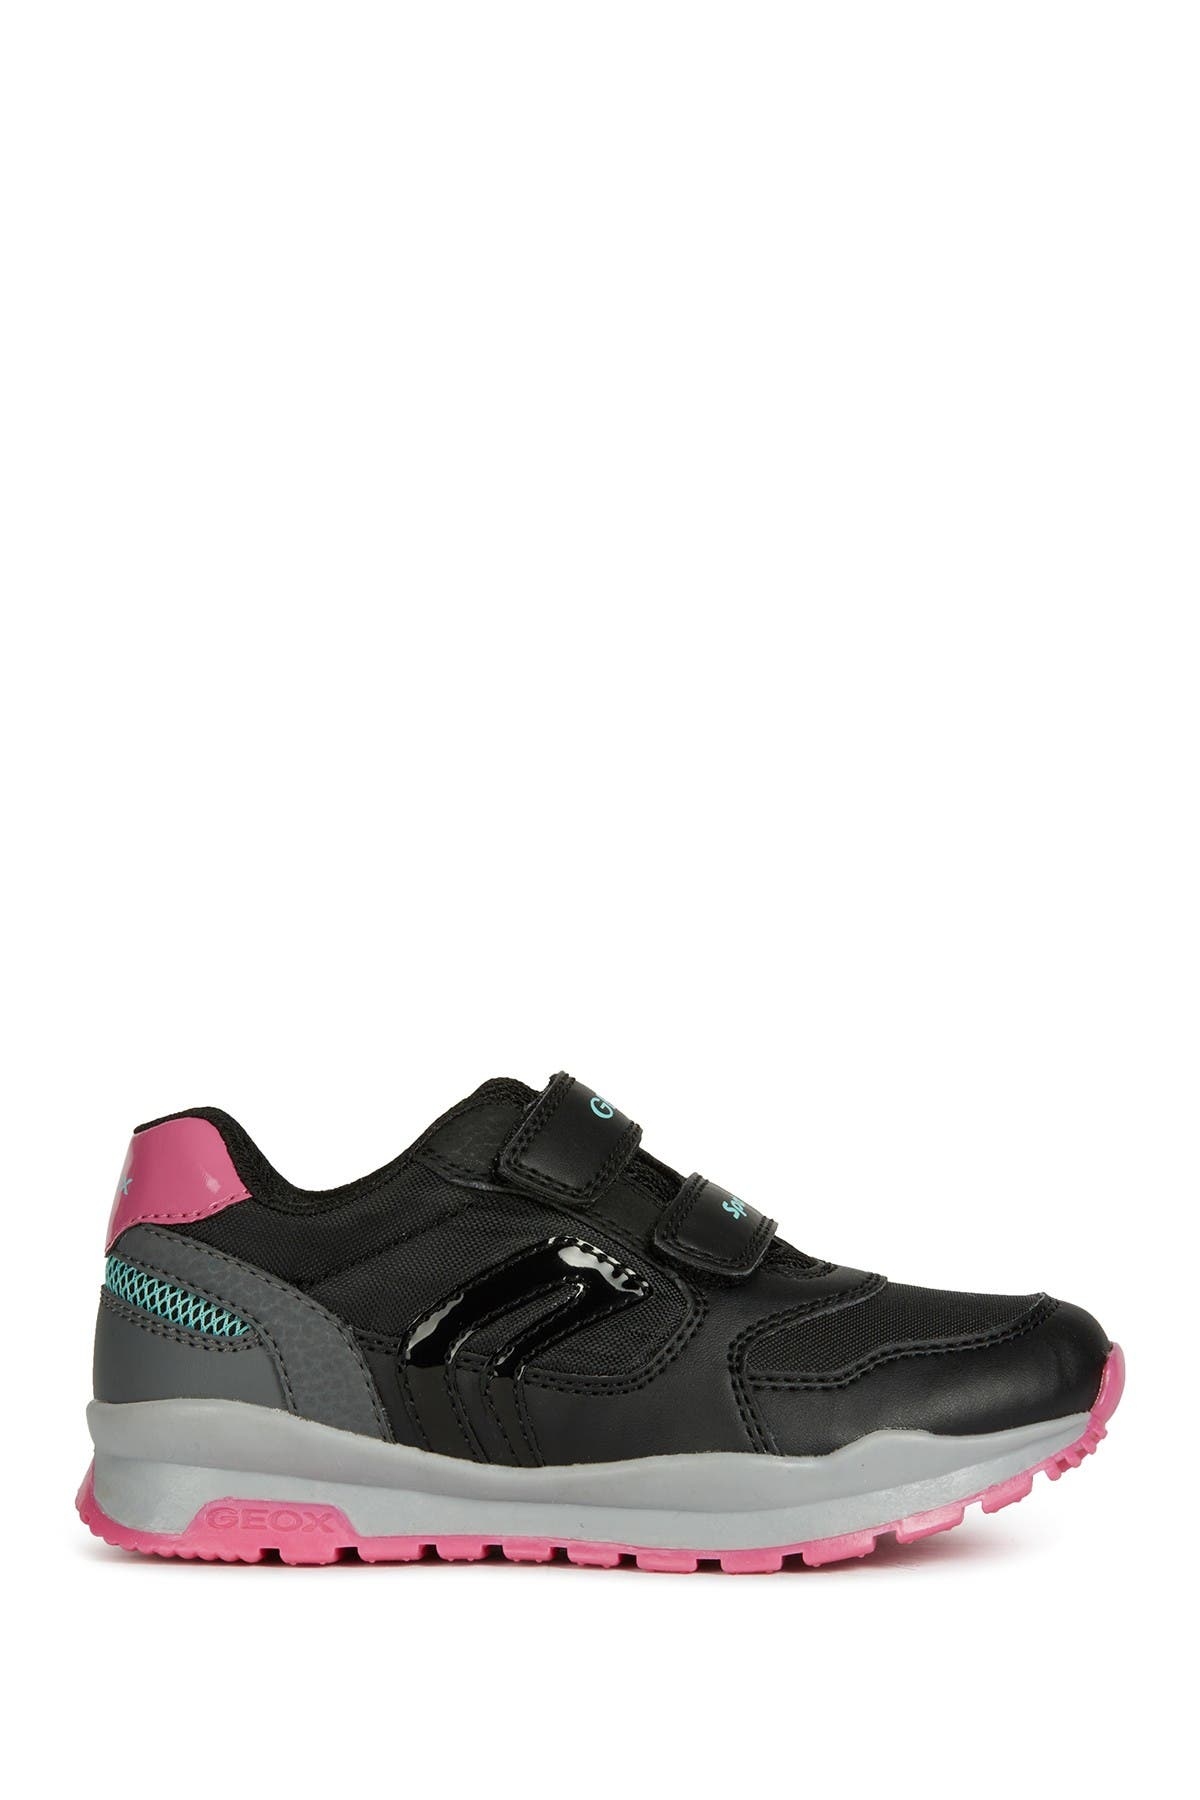 GEOX Pavel Girl 7 Sneaker